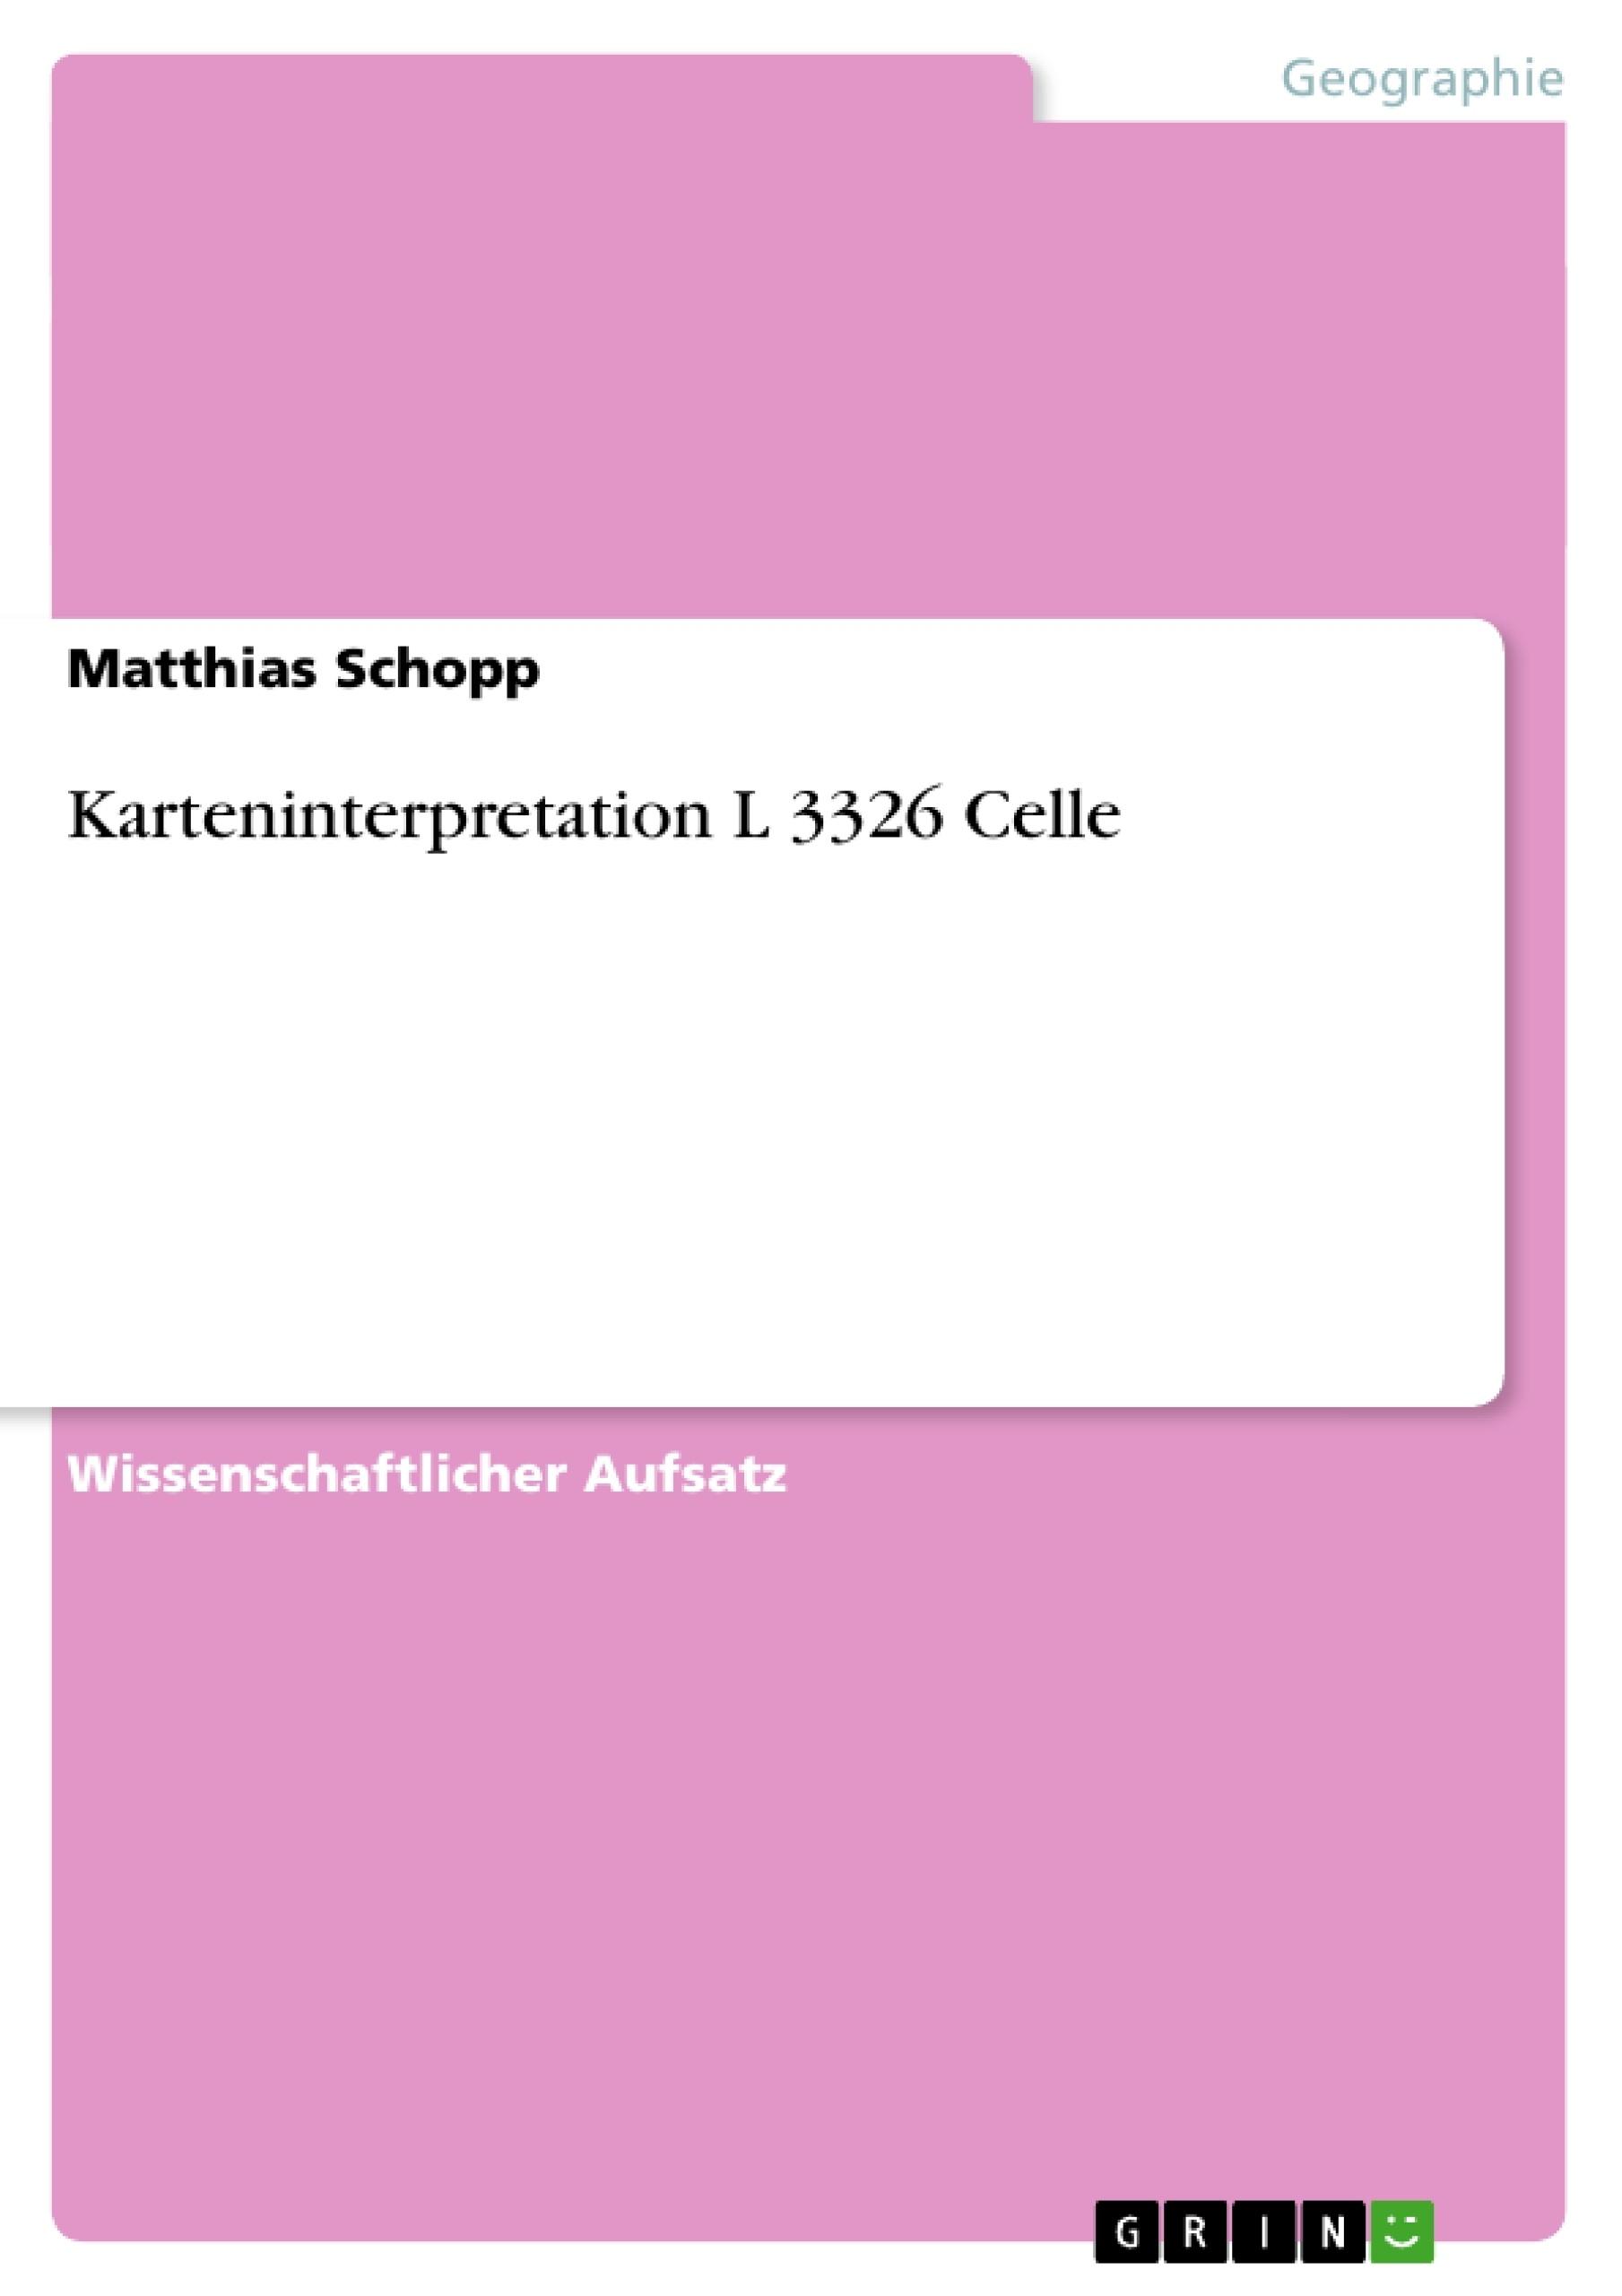 Titel: Karteninterpretation L 3326 Celle